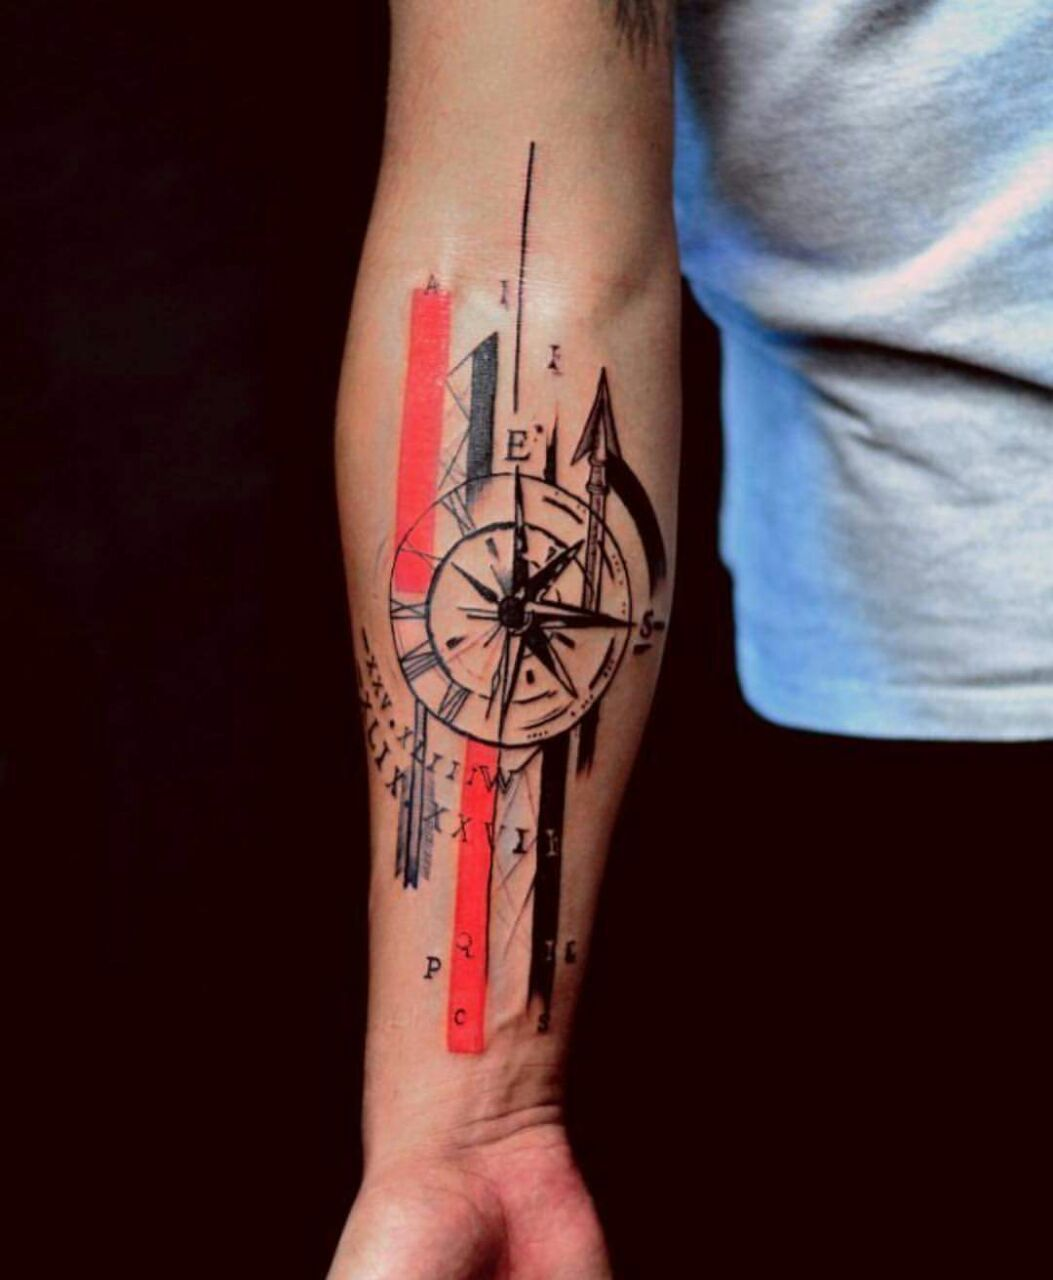 Pin De Omar Sarmiento En Tatooos Tatuajes Tatuajes Abstractos